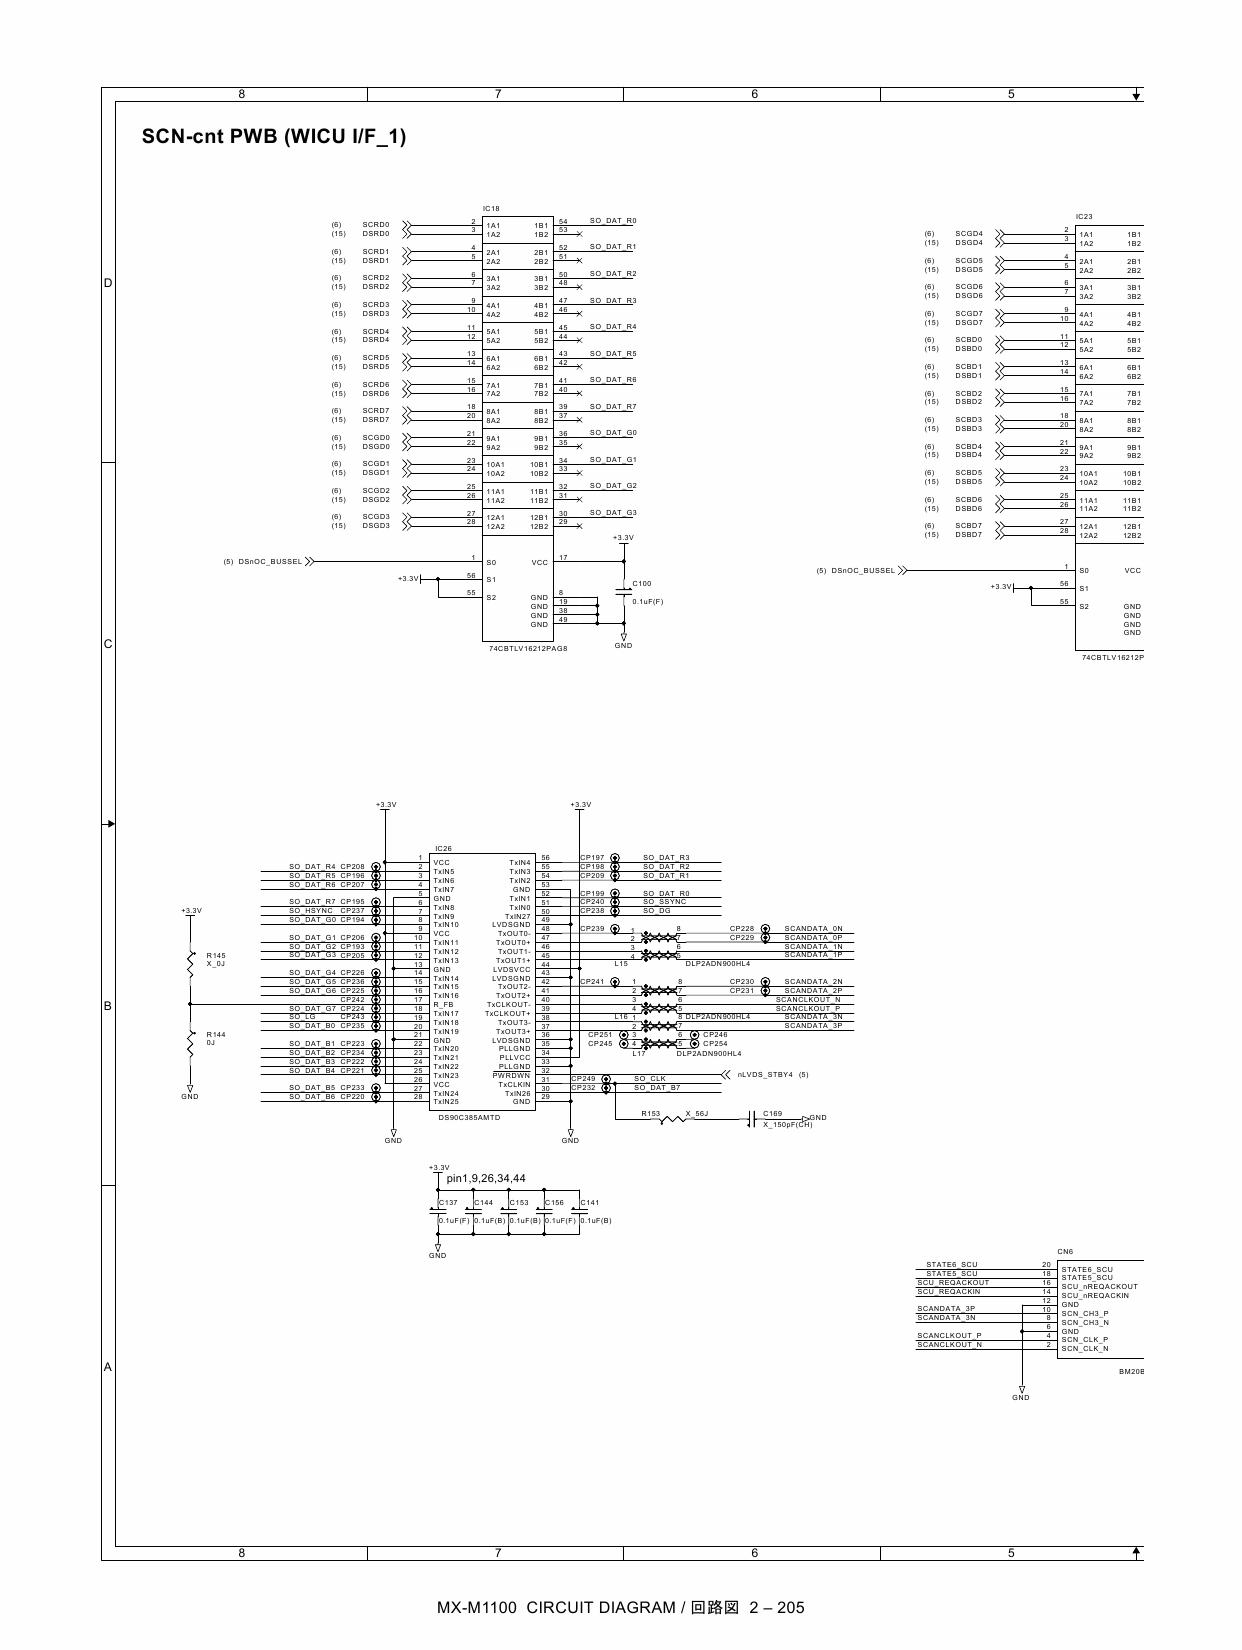 sharp mx m850 m950 m1100 circuit diagrams